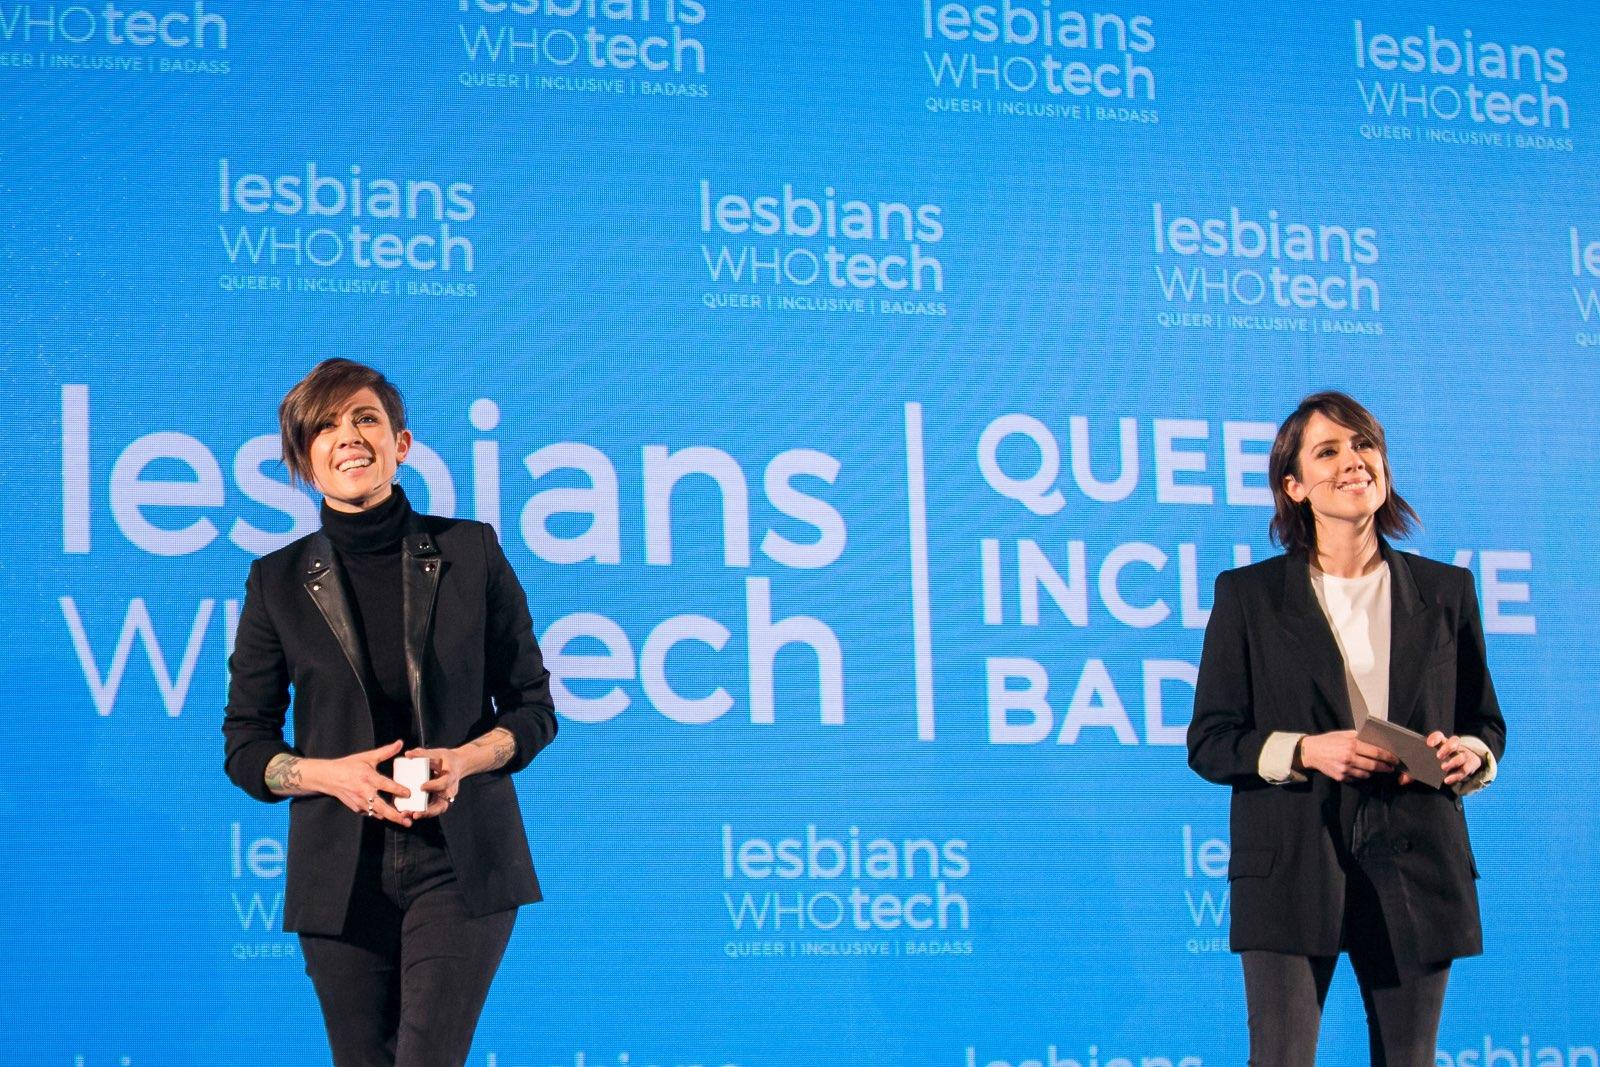 tegan-and-sara-lesbians-who-tech